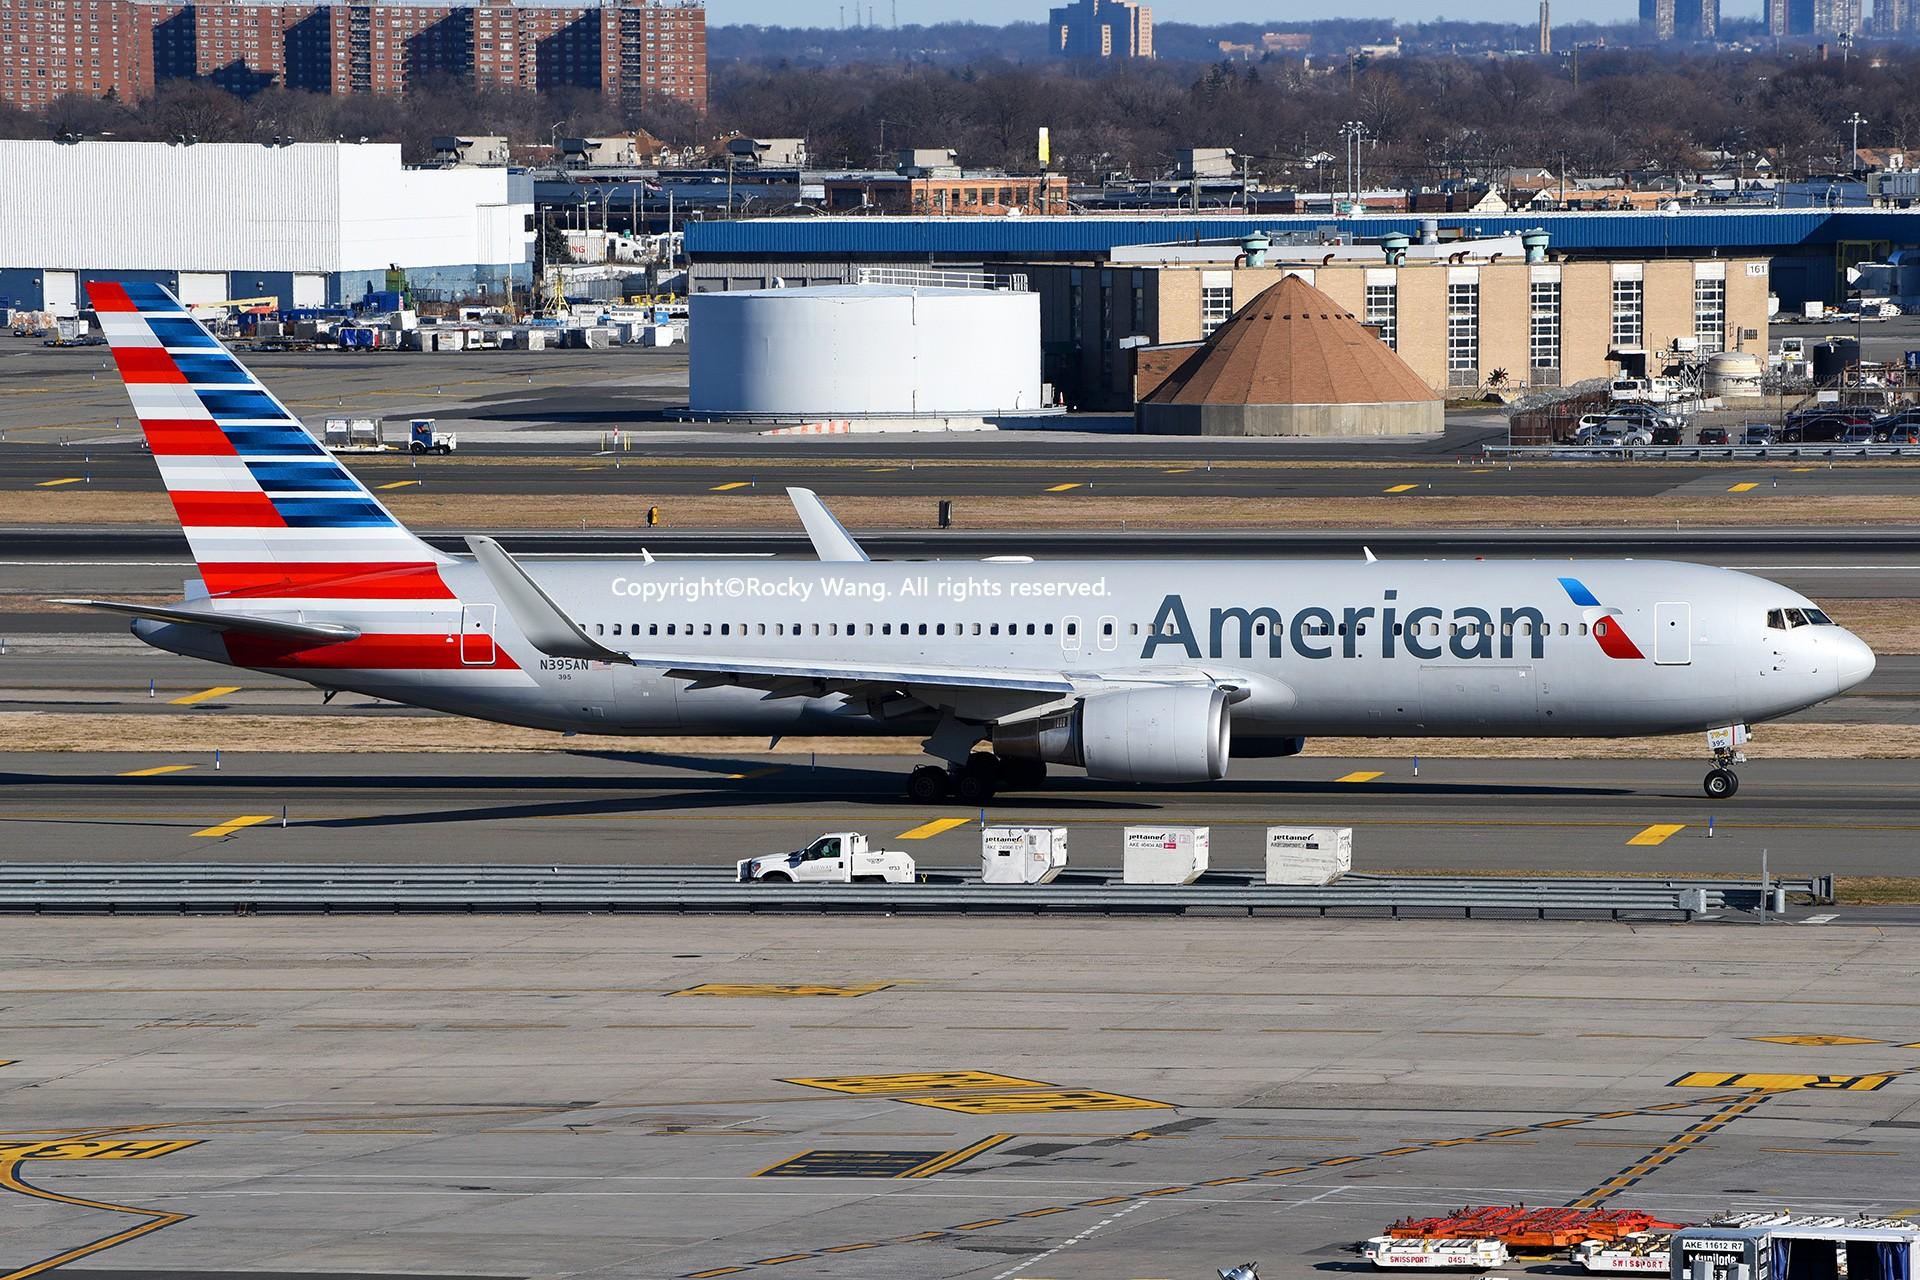 Re:[原创]KJFK 30图 BOEING 767-323(ER) N395AN New York John F. Kennedy Int'l Airport